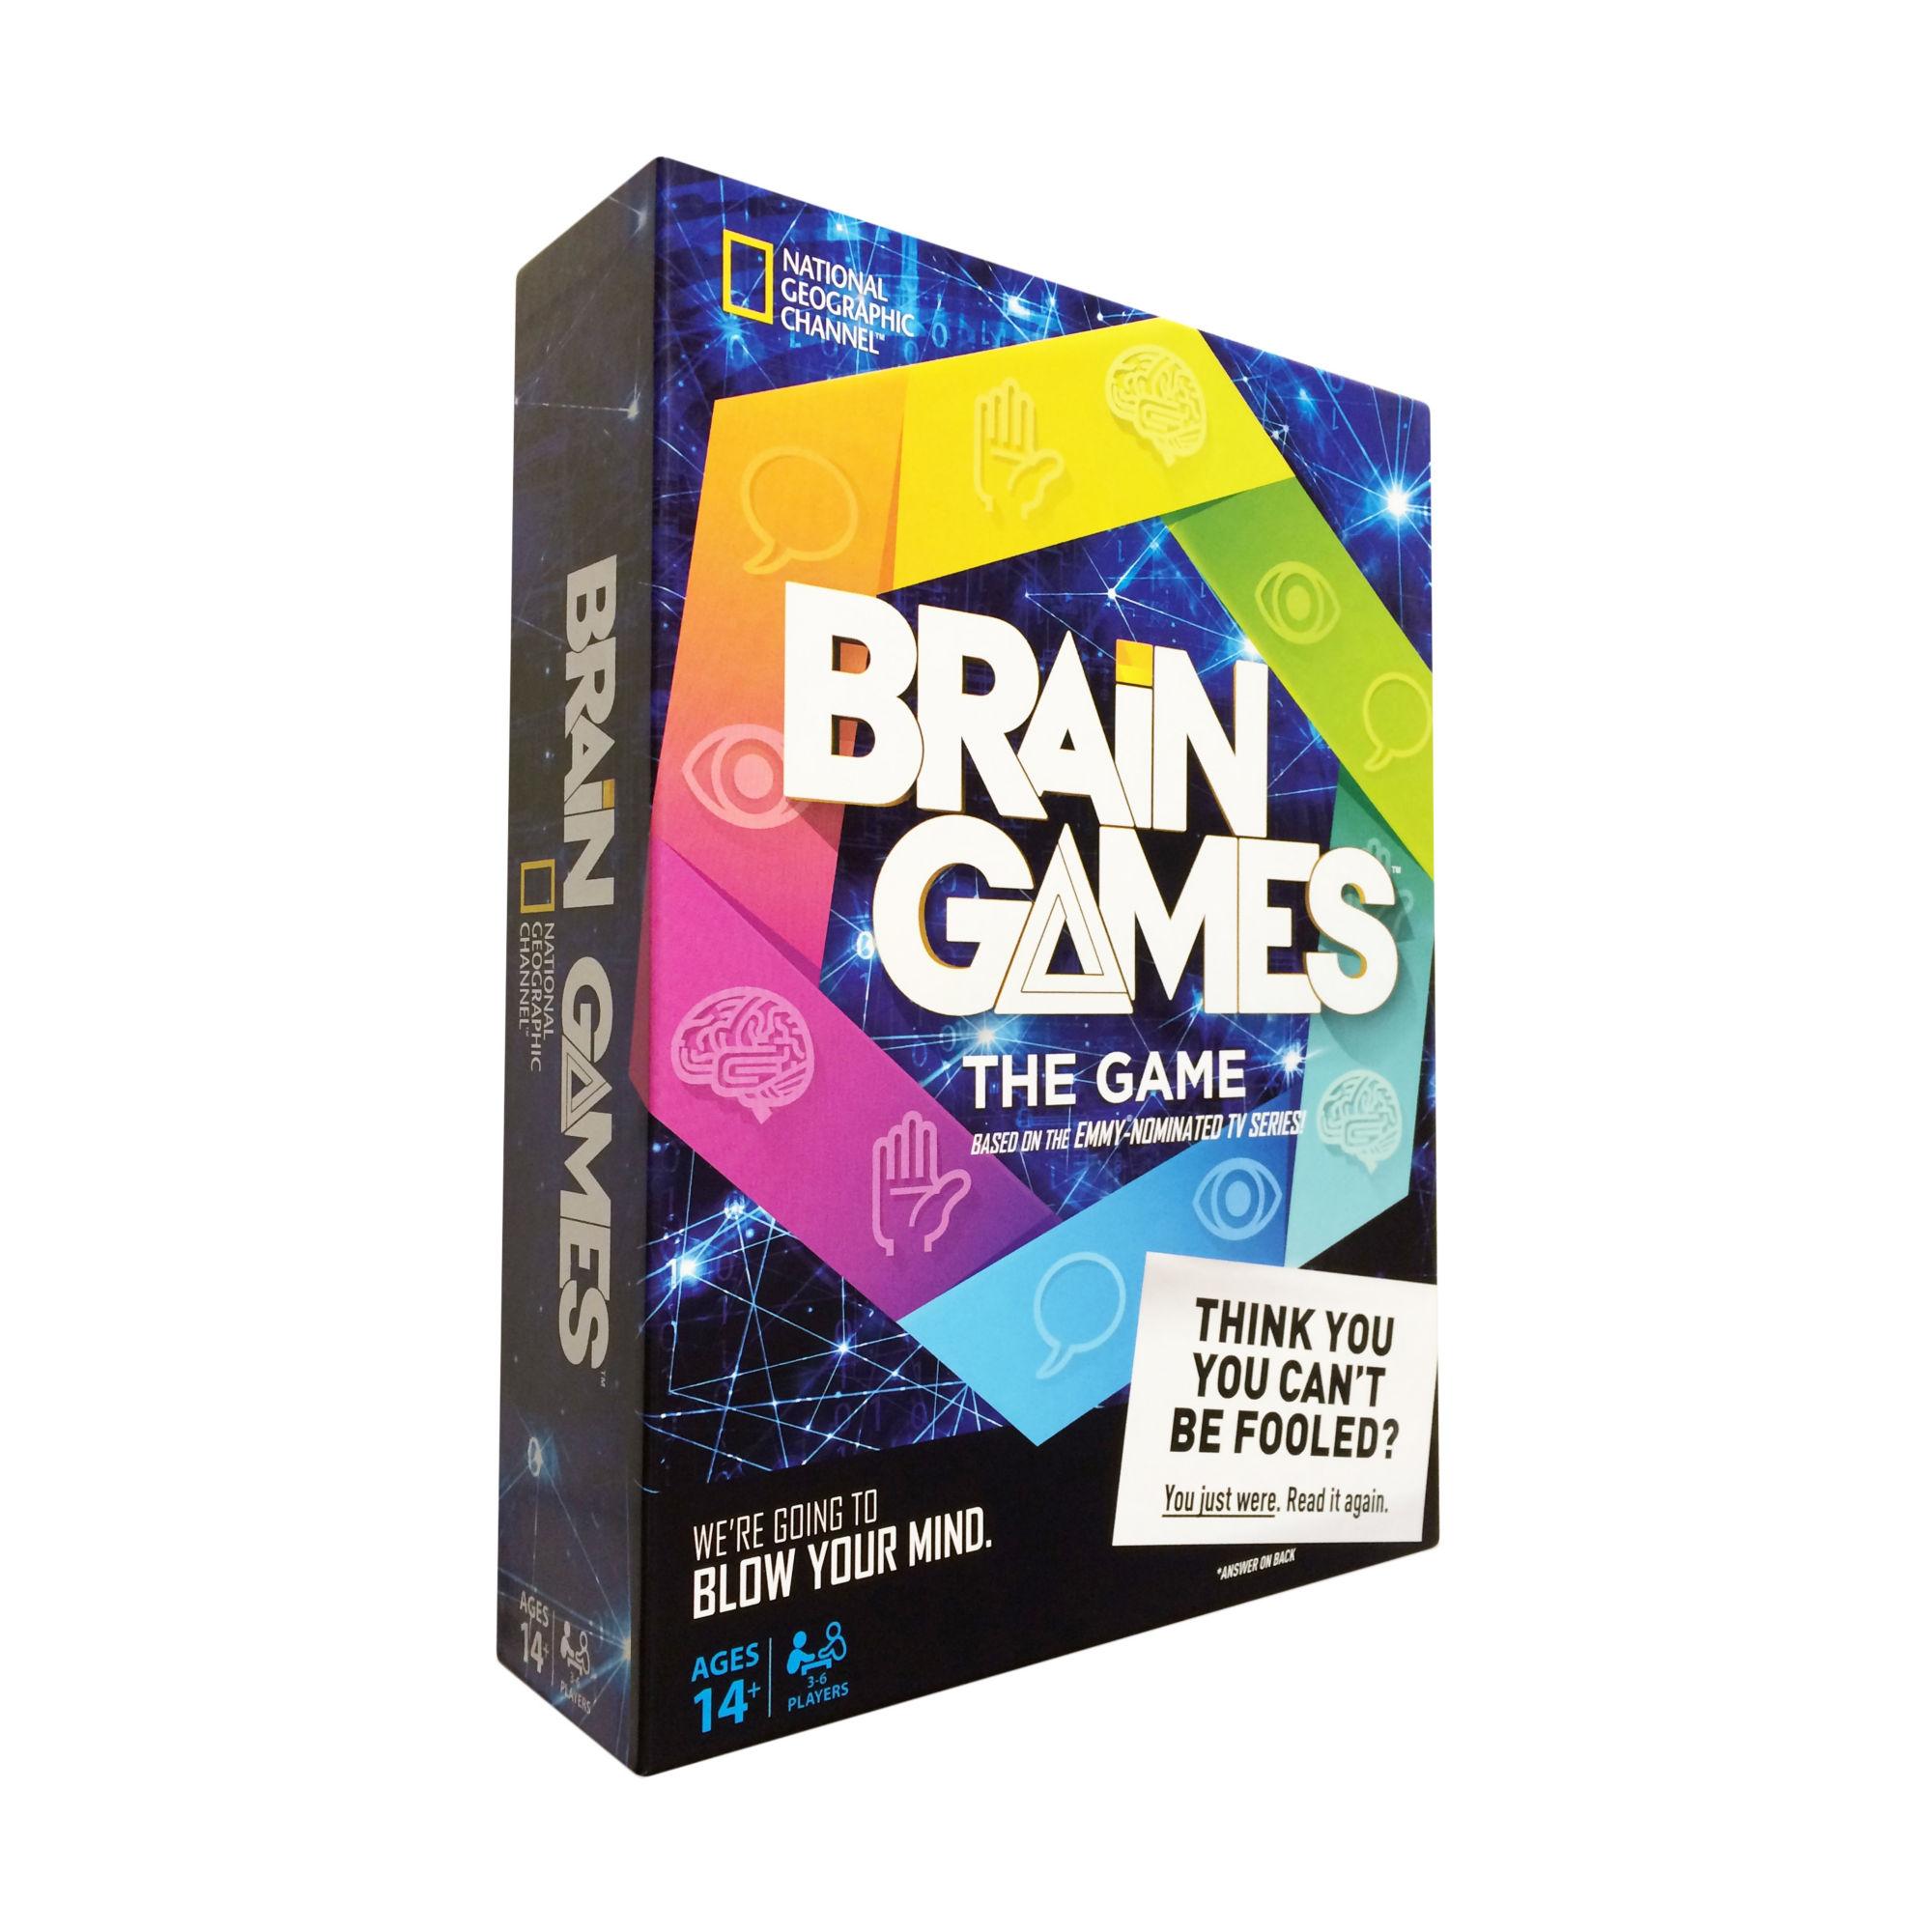 079346001347 Upc Buffalo Games Brain Games The Game